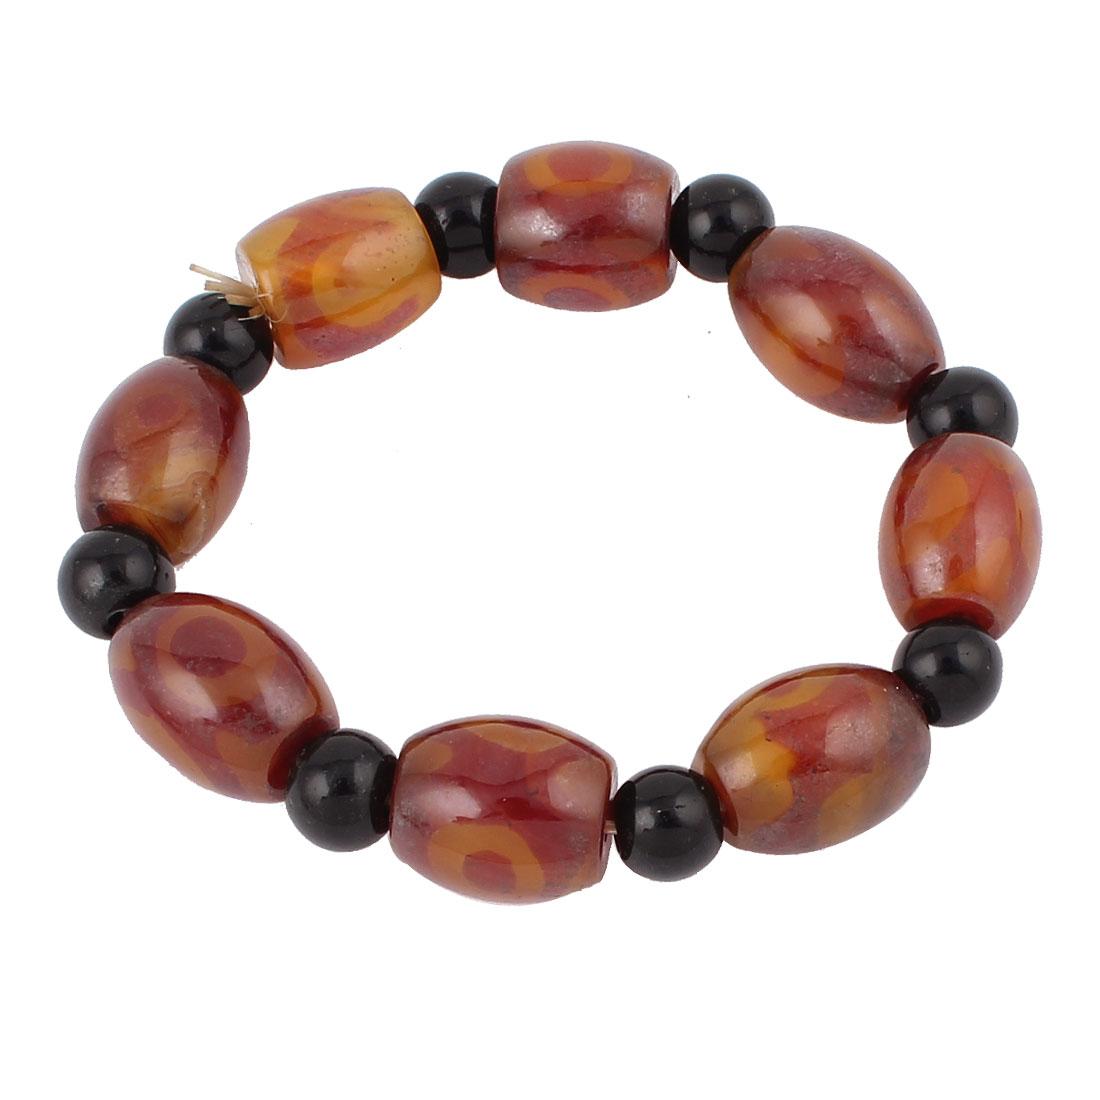 Unisex Tibetan Style Jewelry DZI Beads Amulet Bangle Bracelet Black Brown